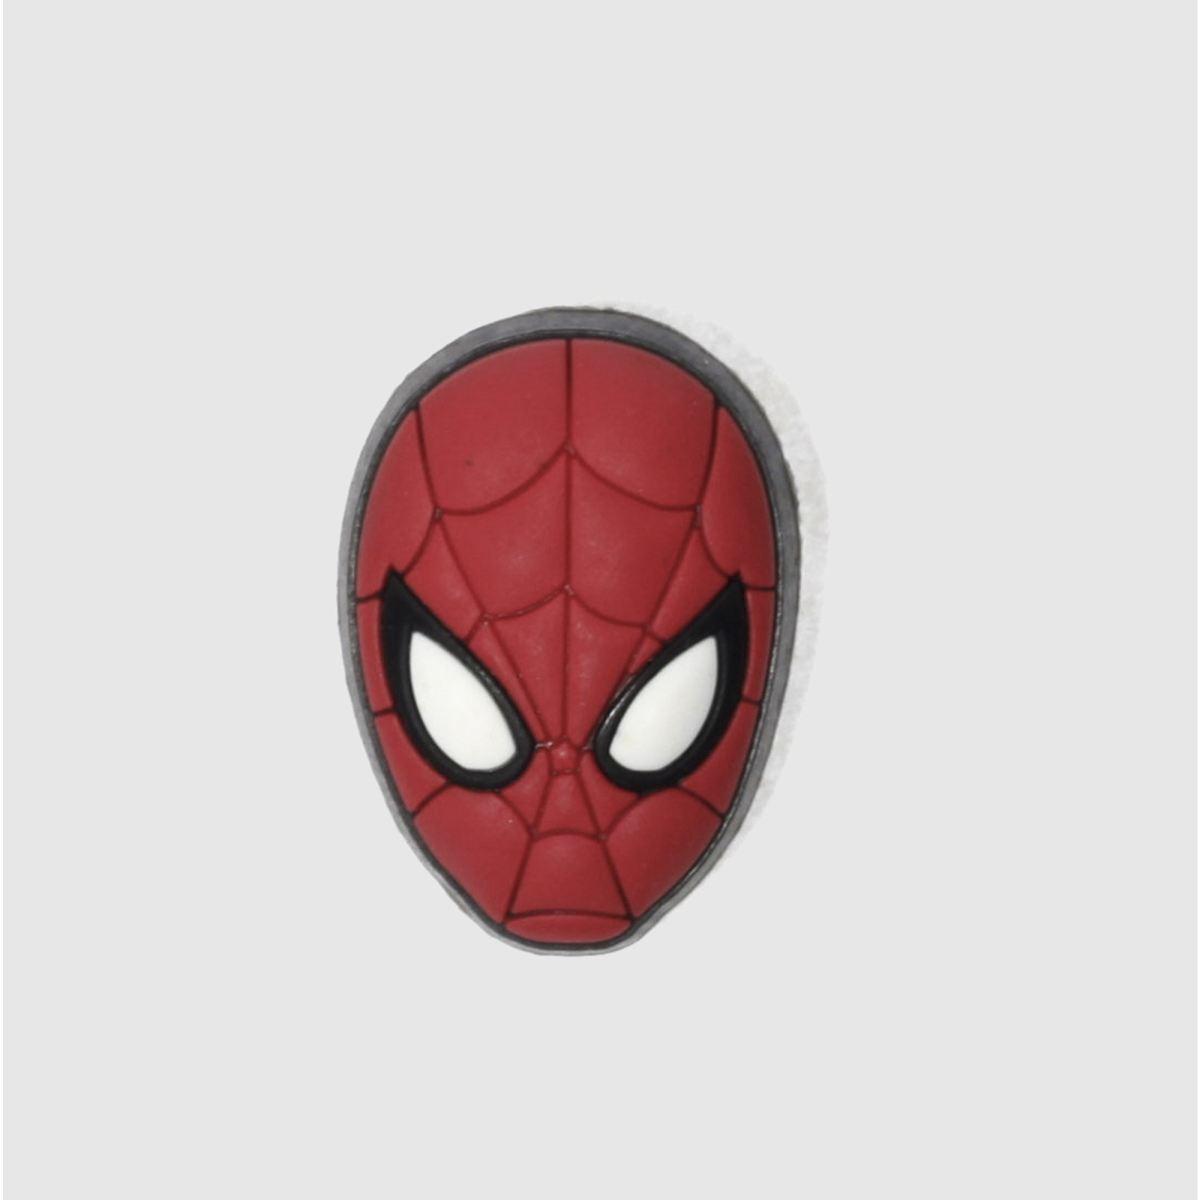 jibbitz Jibbitz Red Spiderman Mask